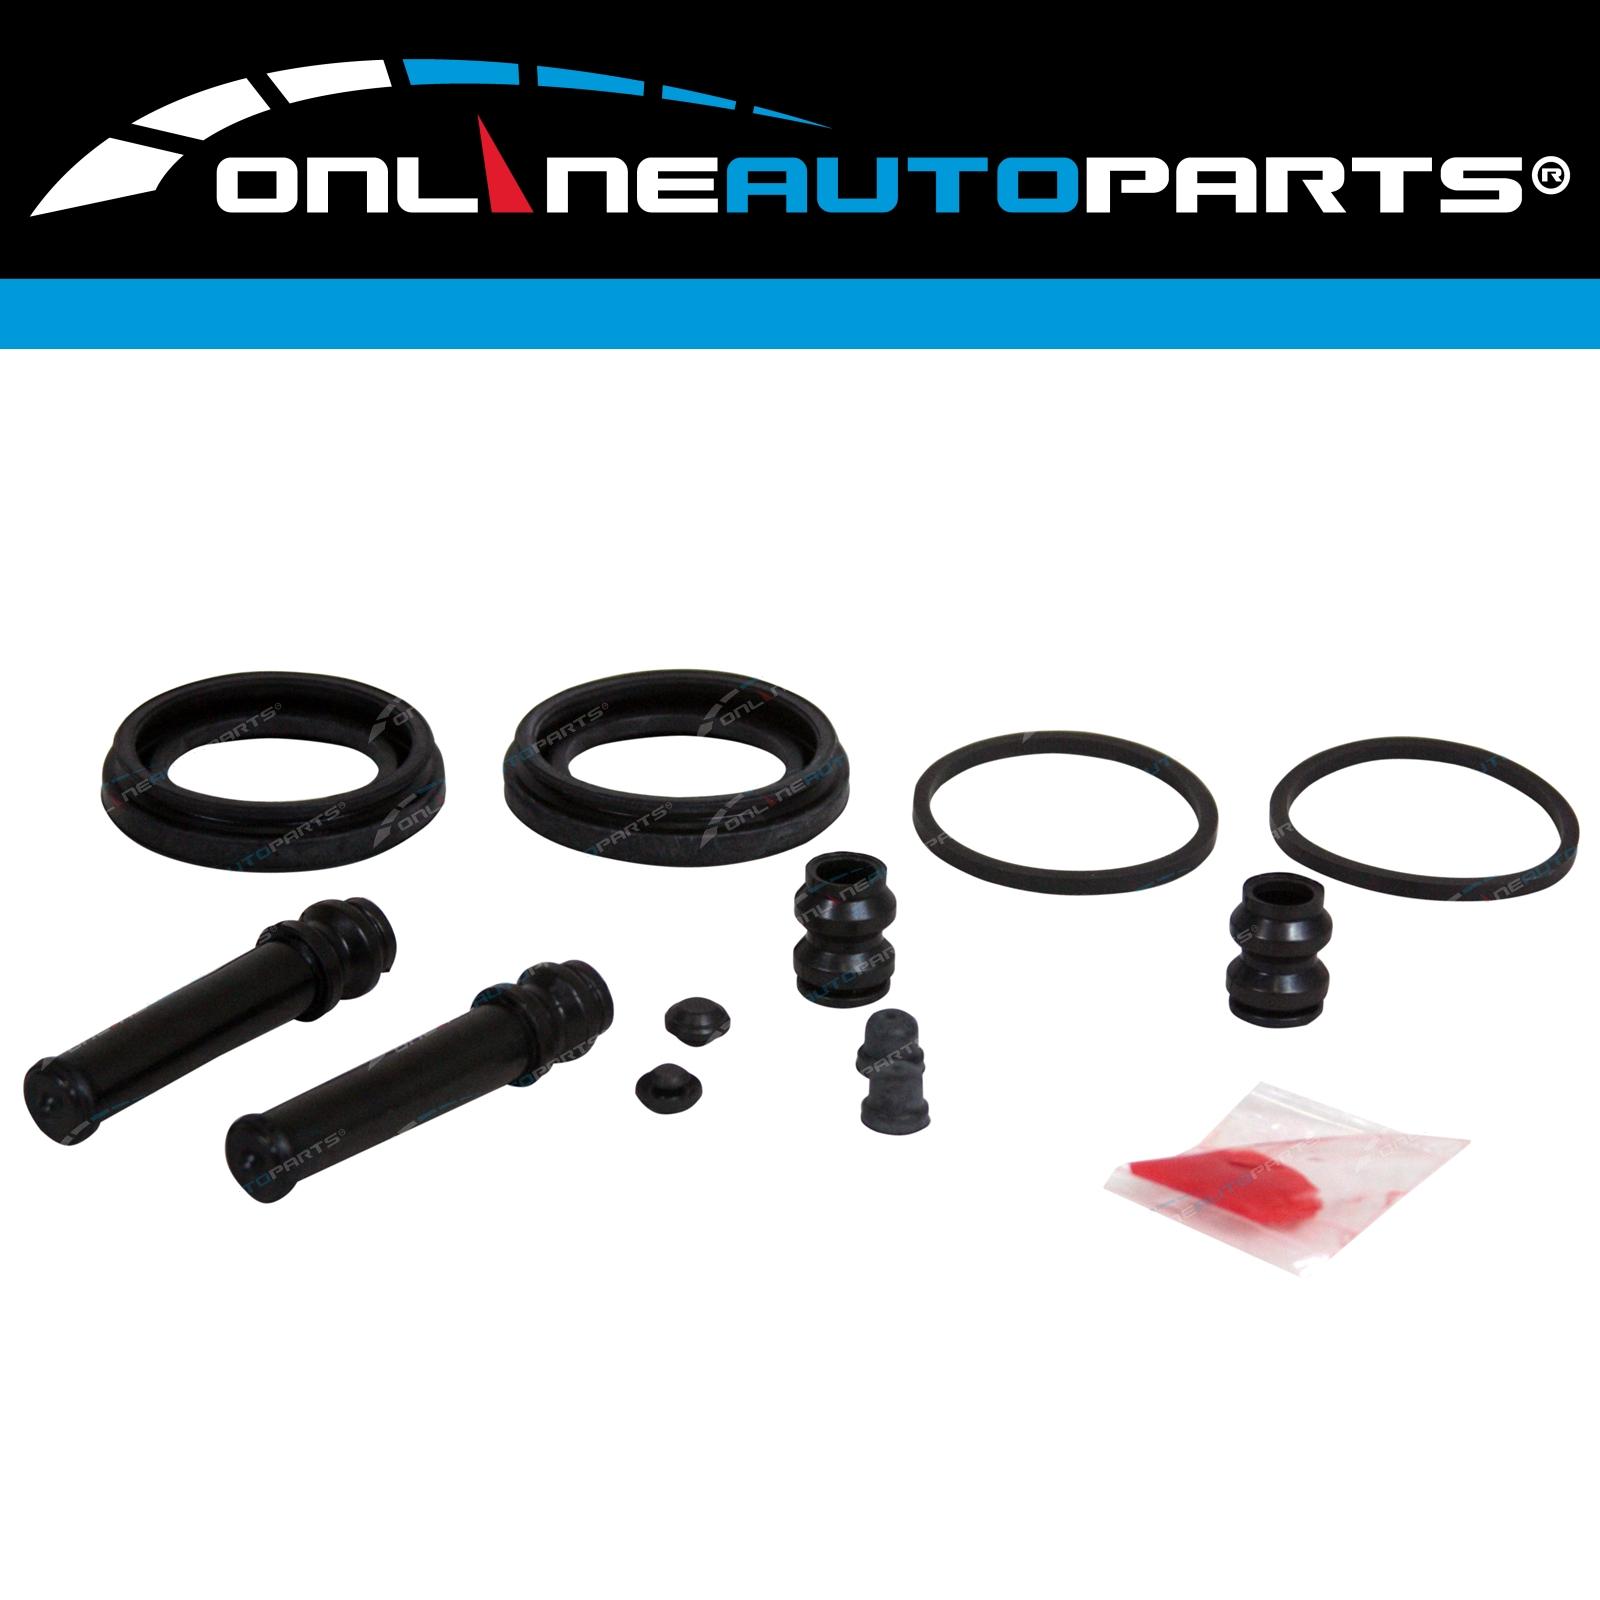 Rear Disc Brake Caliper Rubber Piston Kit suits Toyota HZJ80 HDJ80 80 Series